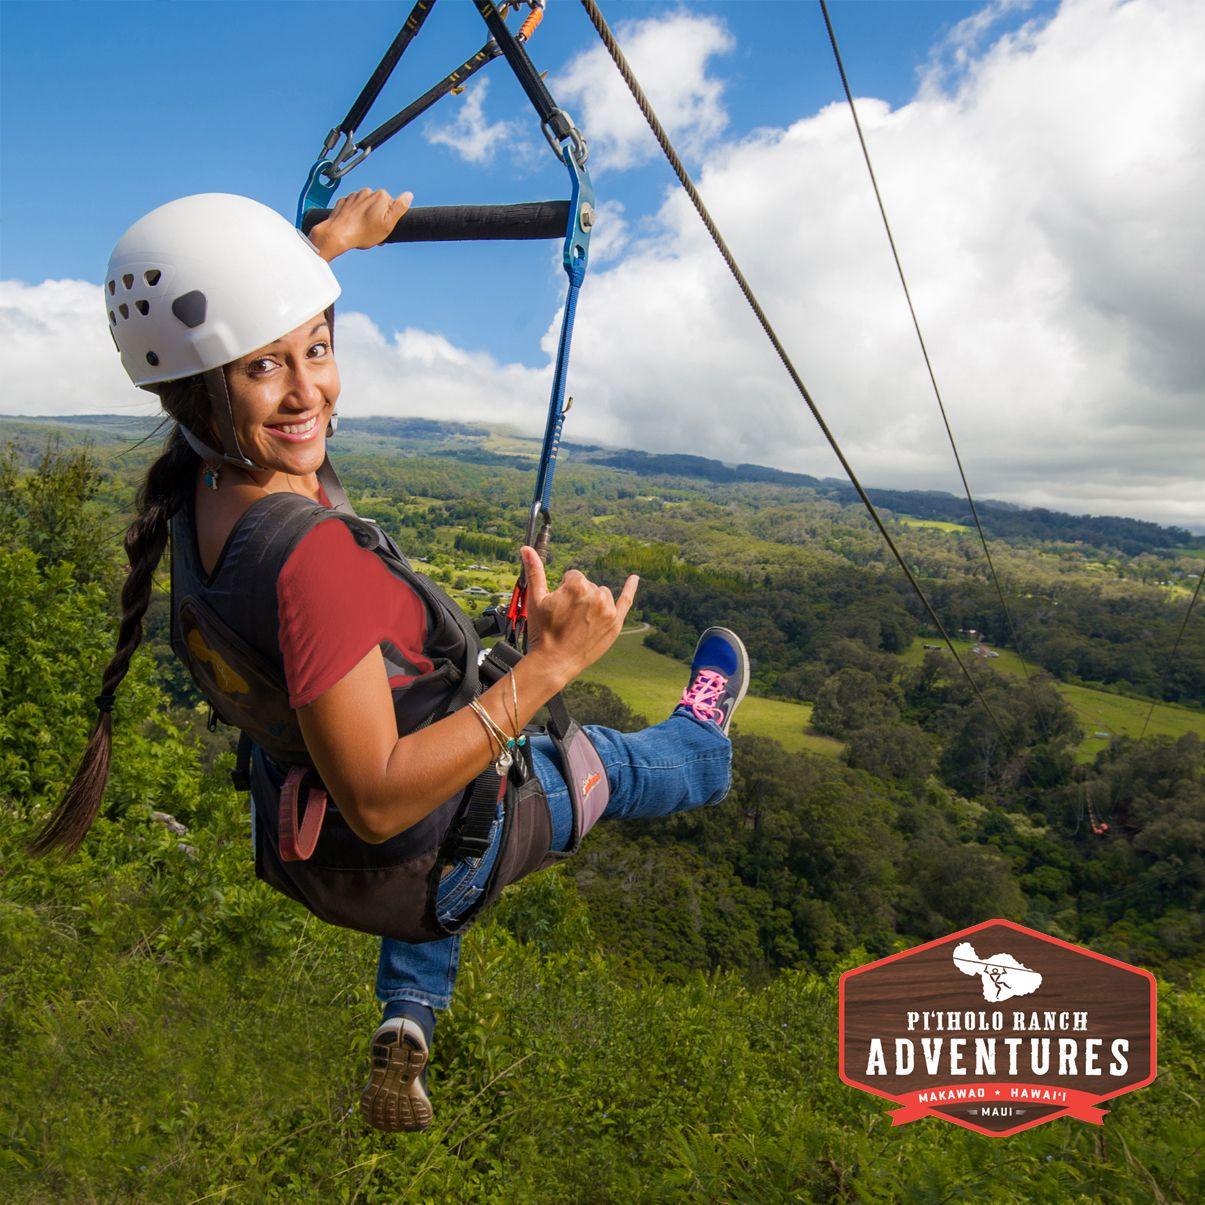 Maui Zipline Piiholozipline Com Adventuretravel Travel Adventure Ttot Travelboldly Action Nature Explore Islands H Trip To Maui Ziplining Maui Travel